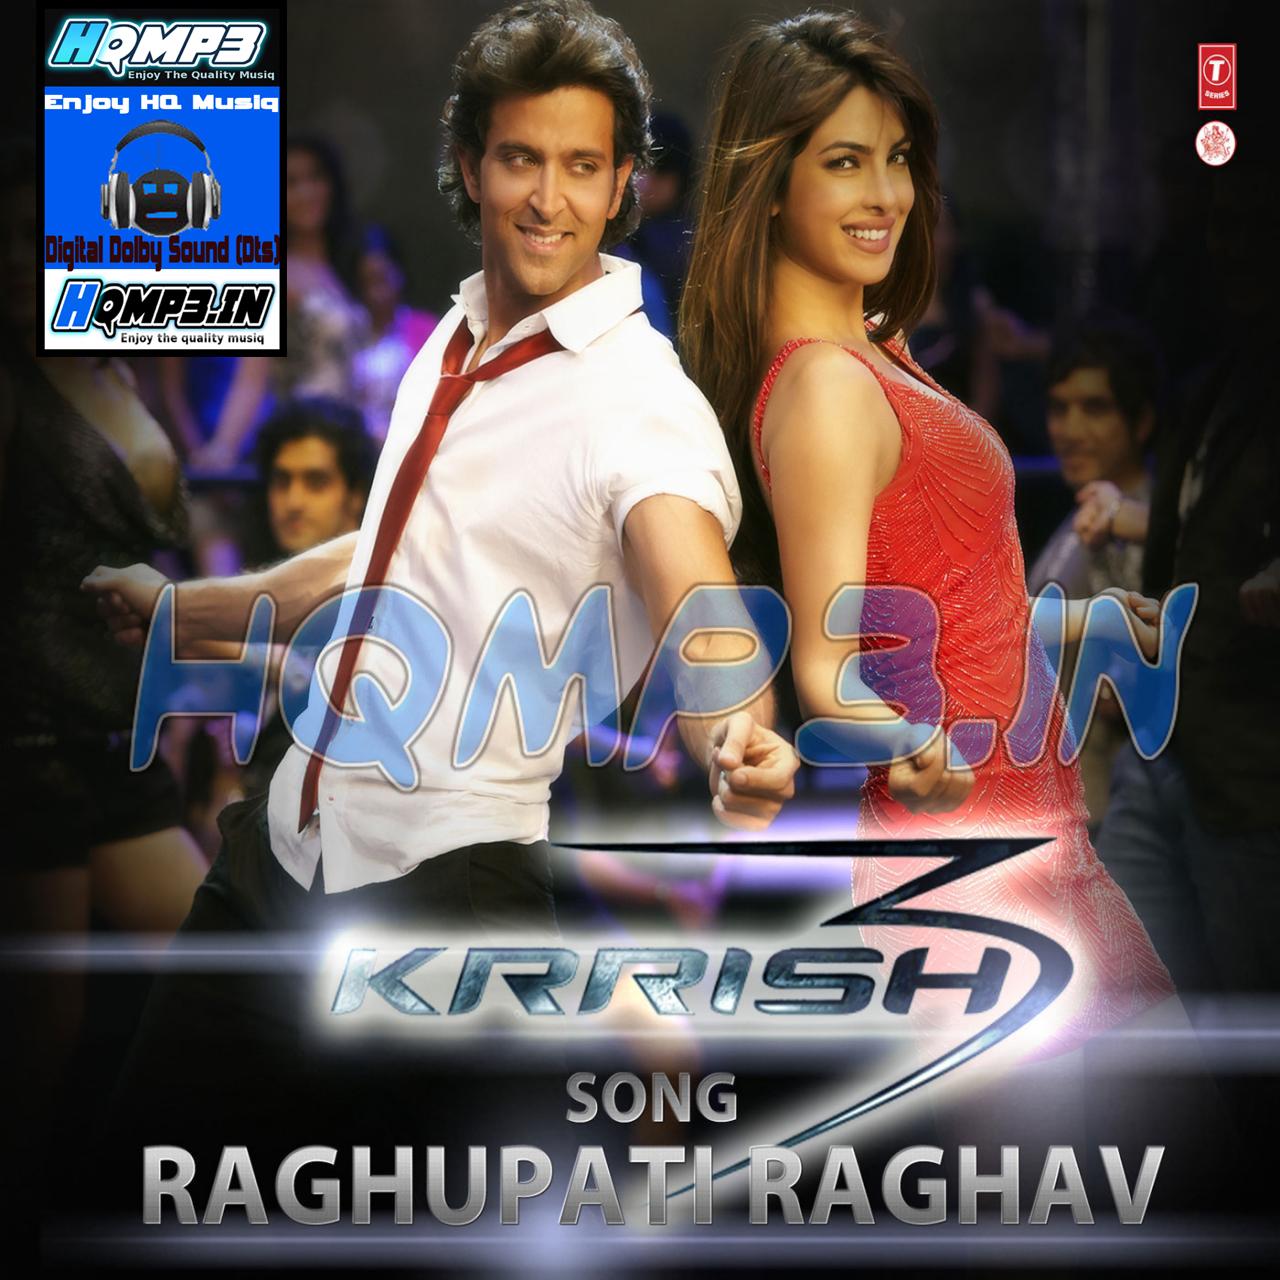 Krrish 3 Songs 2013 Hindi Mp3 Songs Free Download